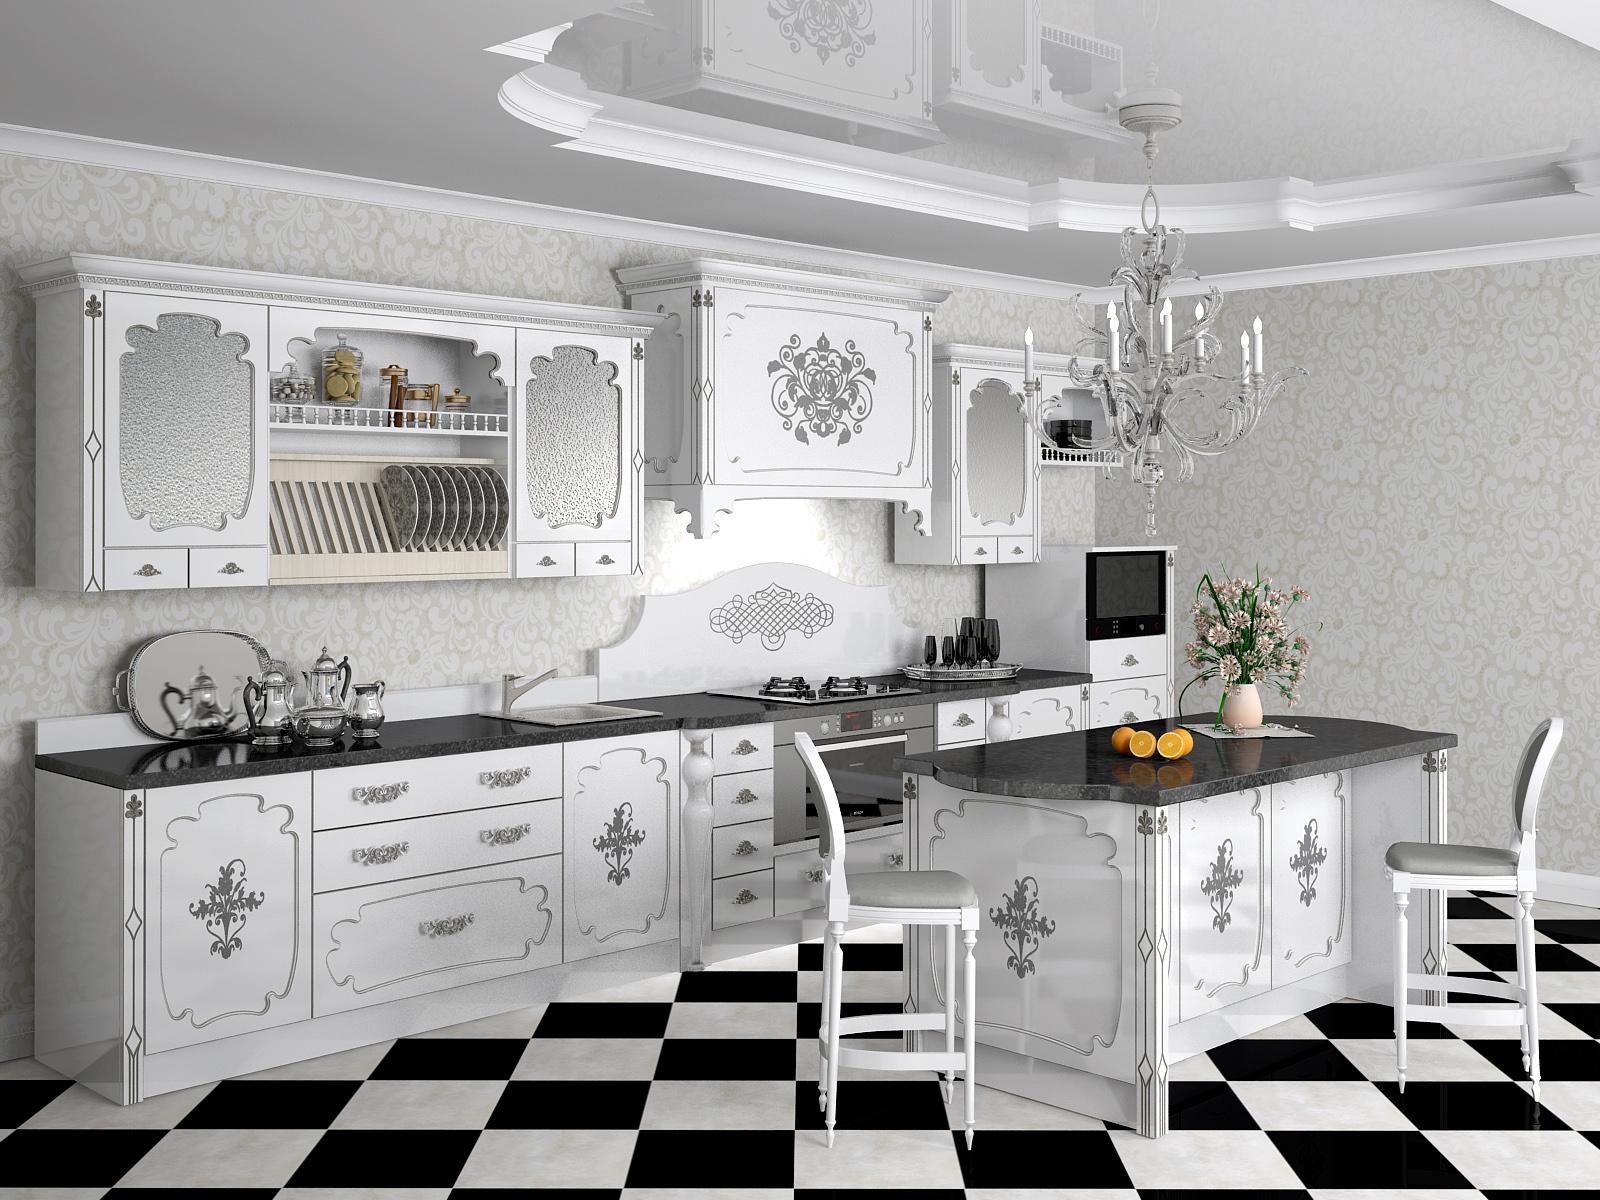 необычный пол на кухне